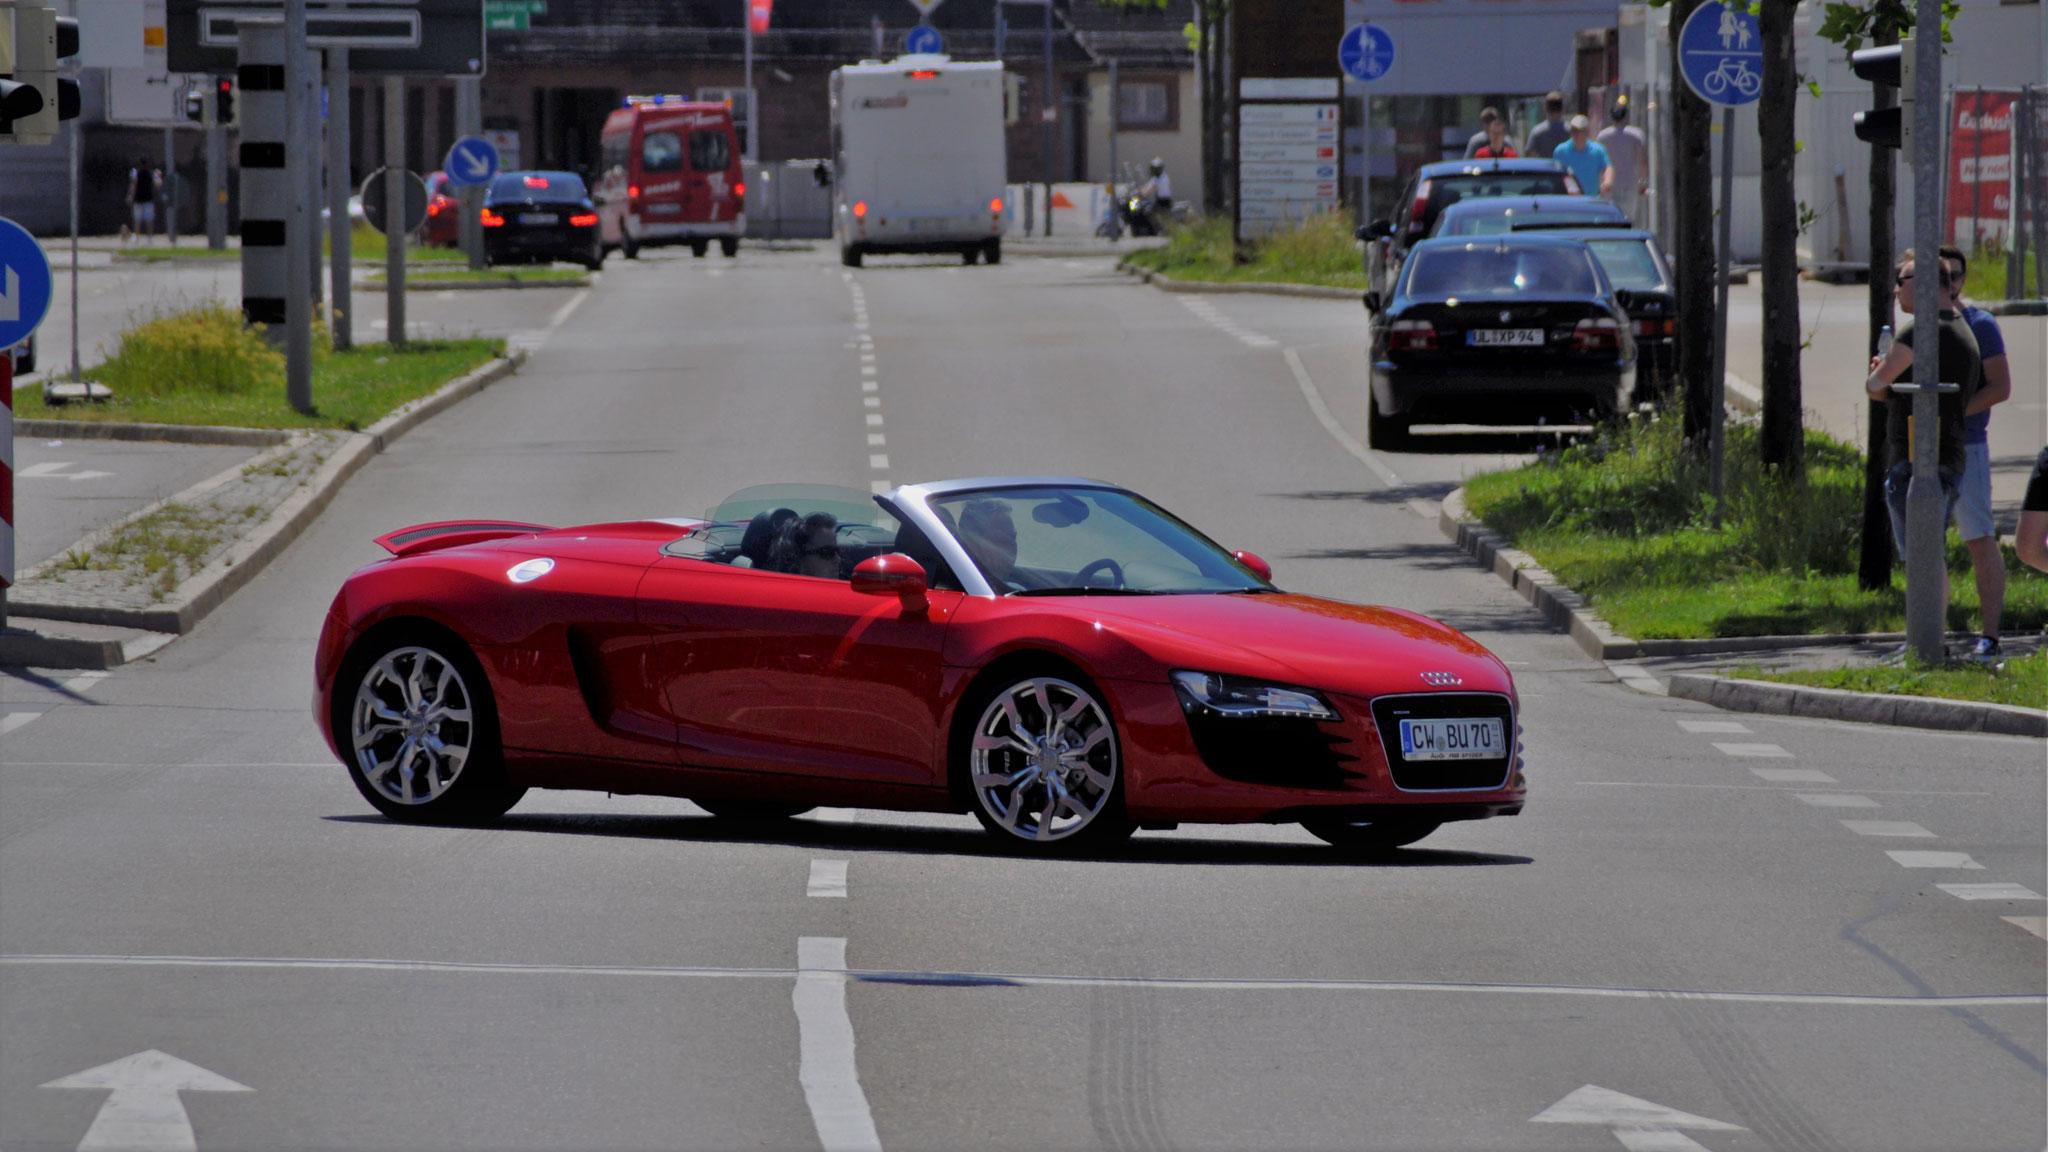 Audi R8 Spyder - CW-BU-70